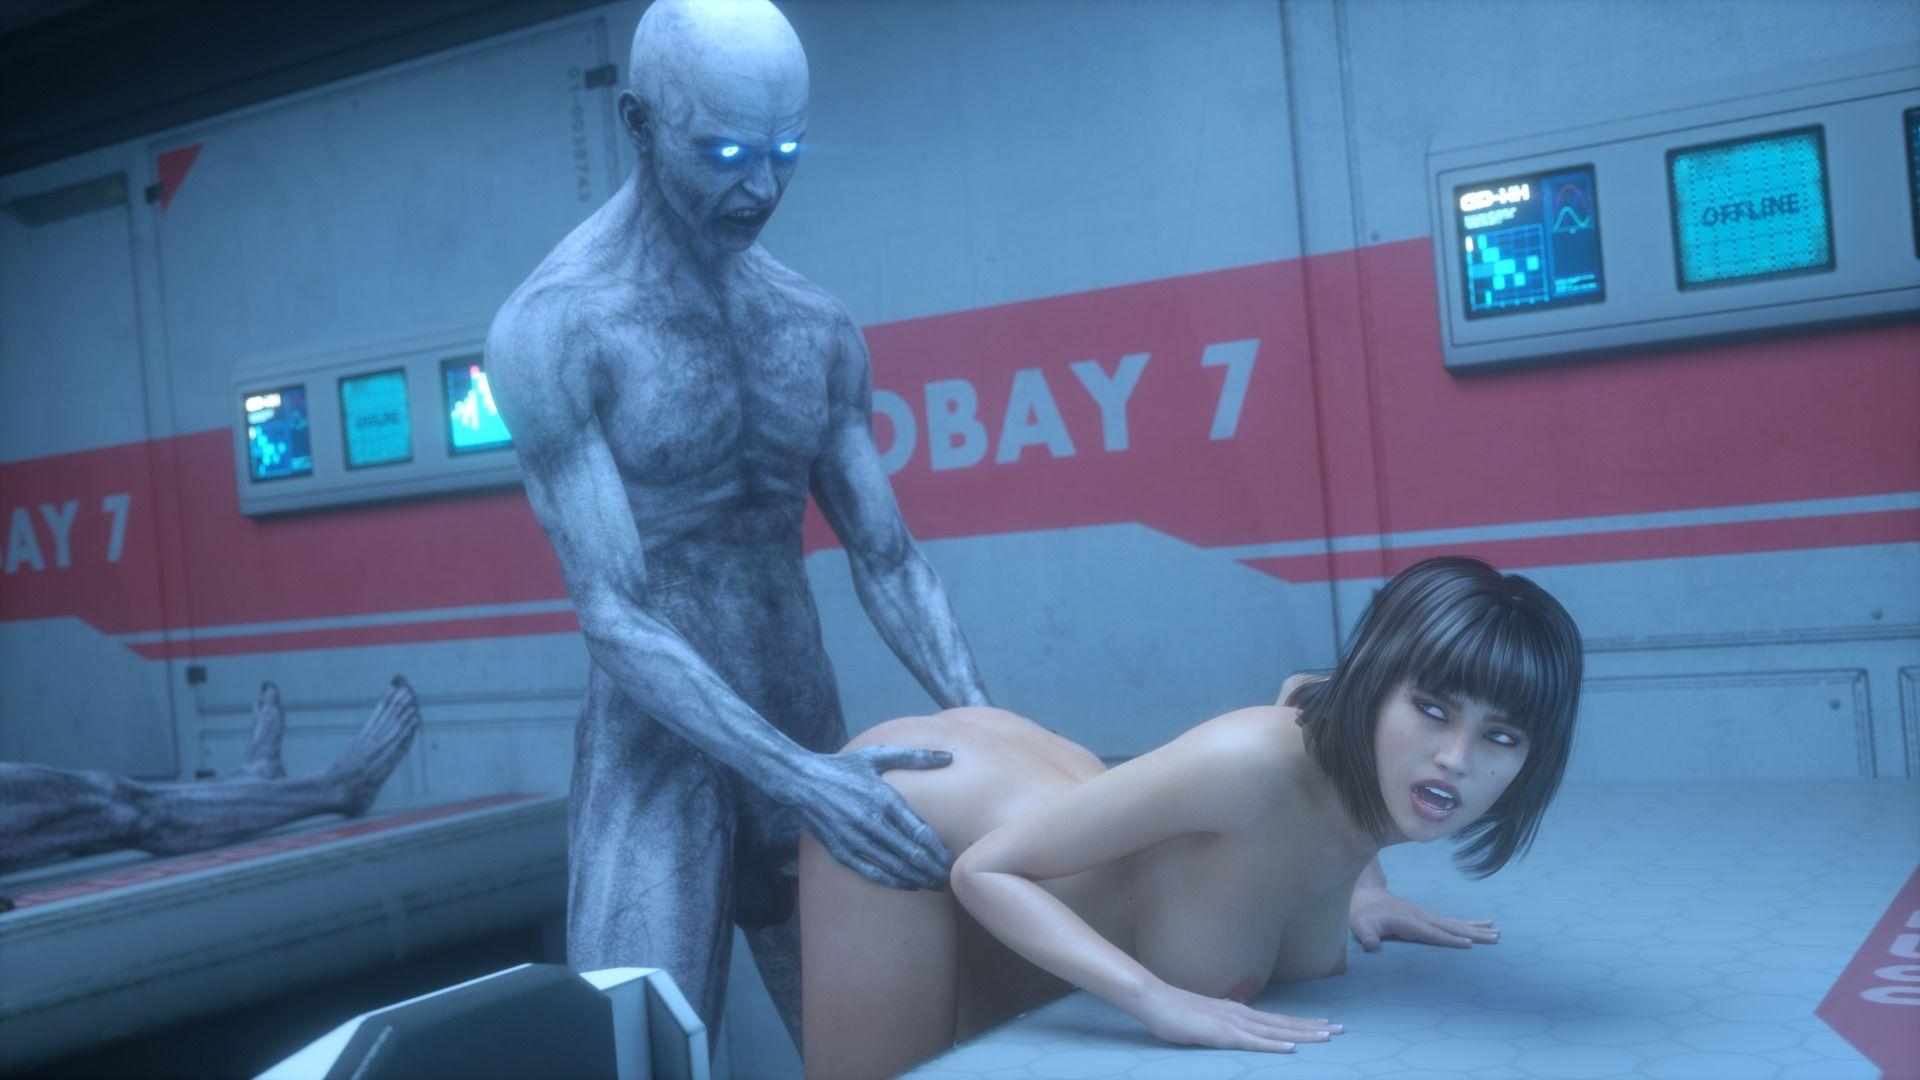 Science fiction men naked, la petite maison in oceanside